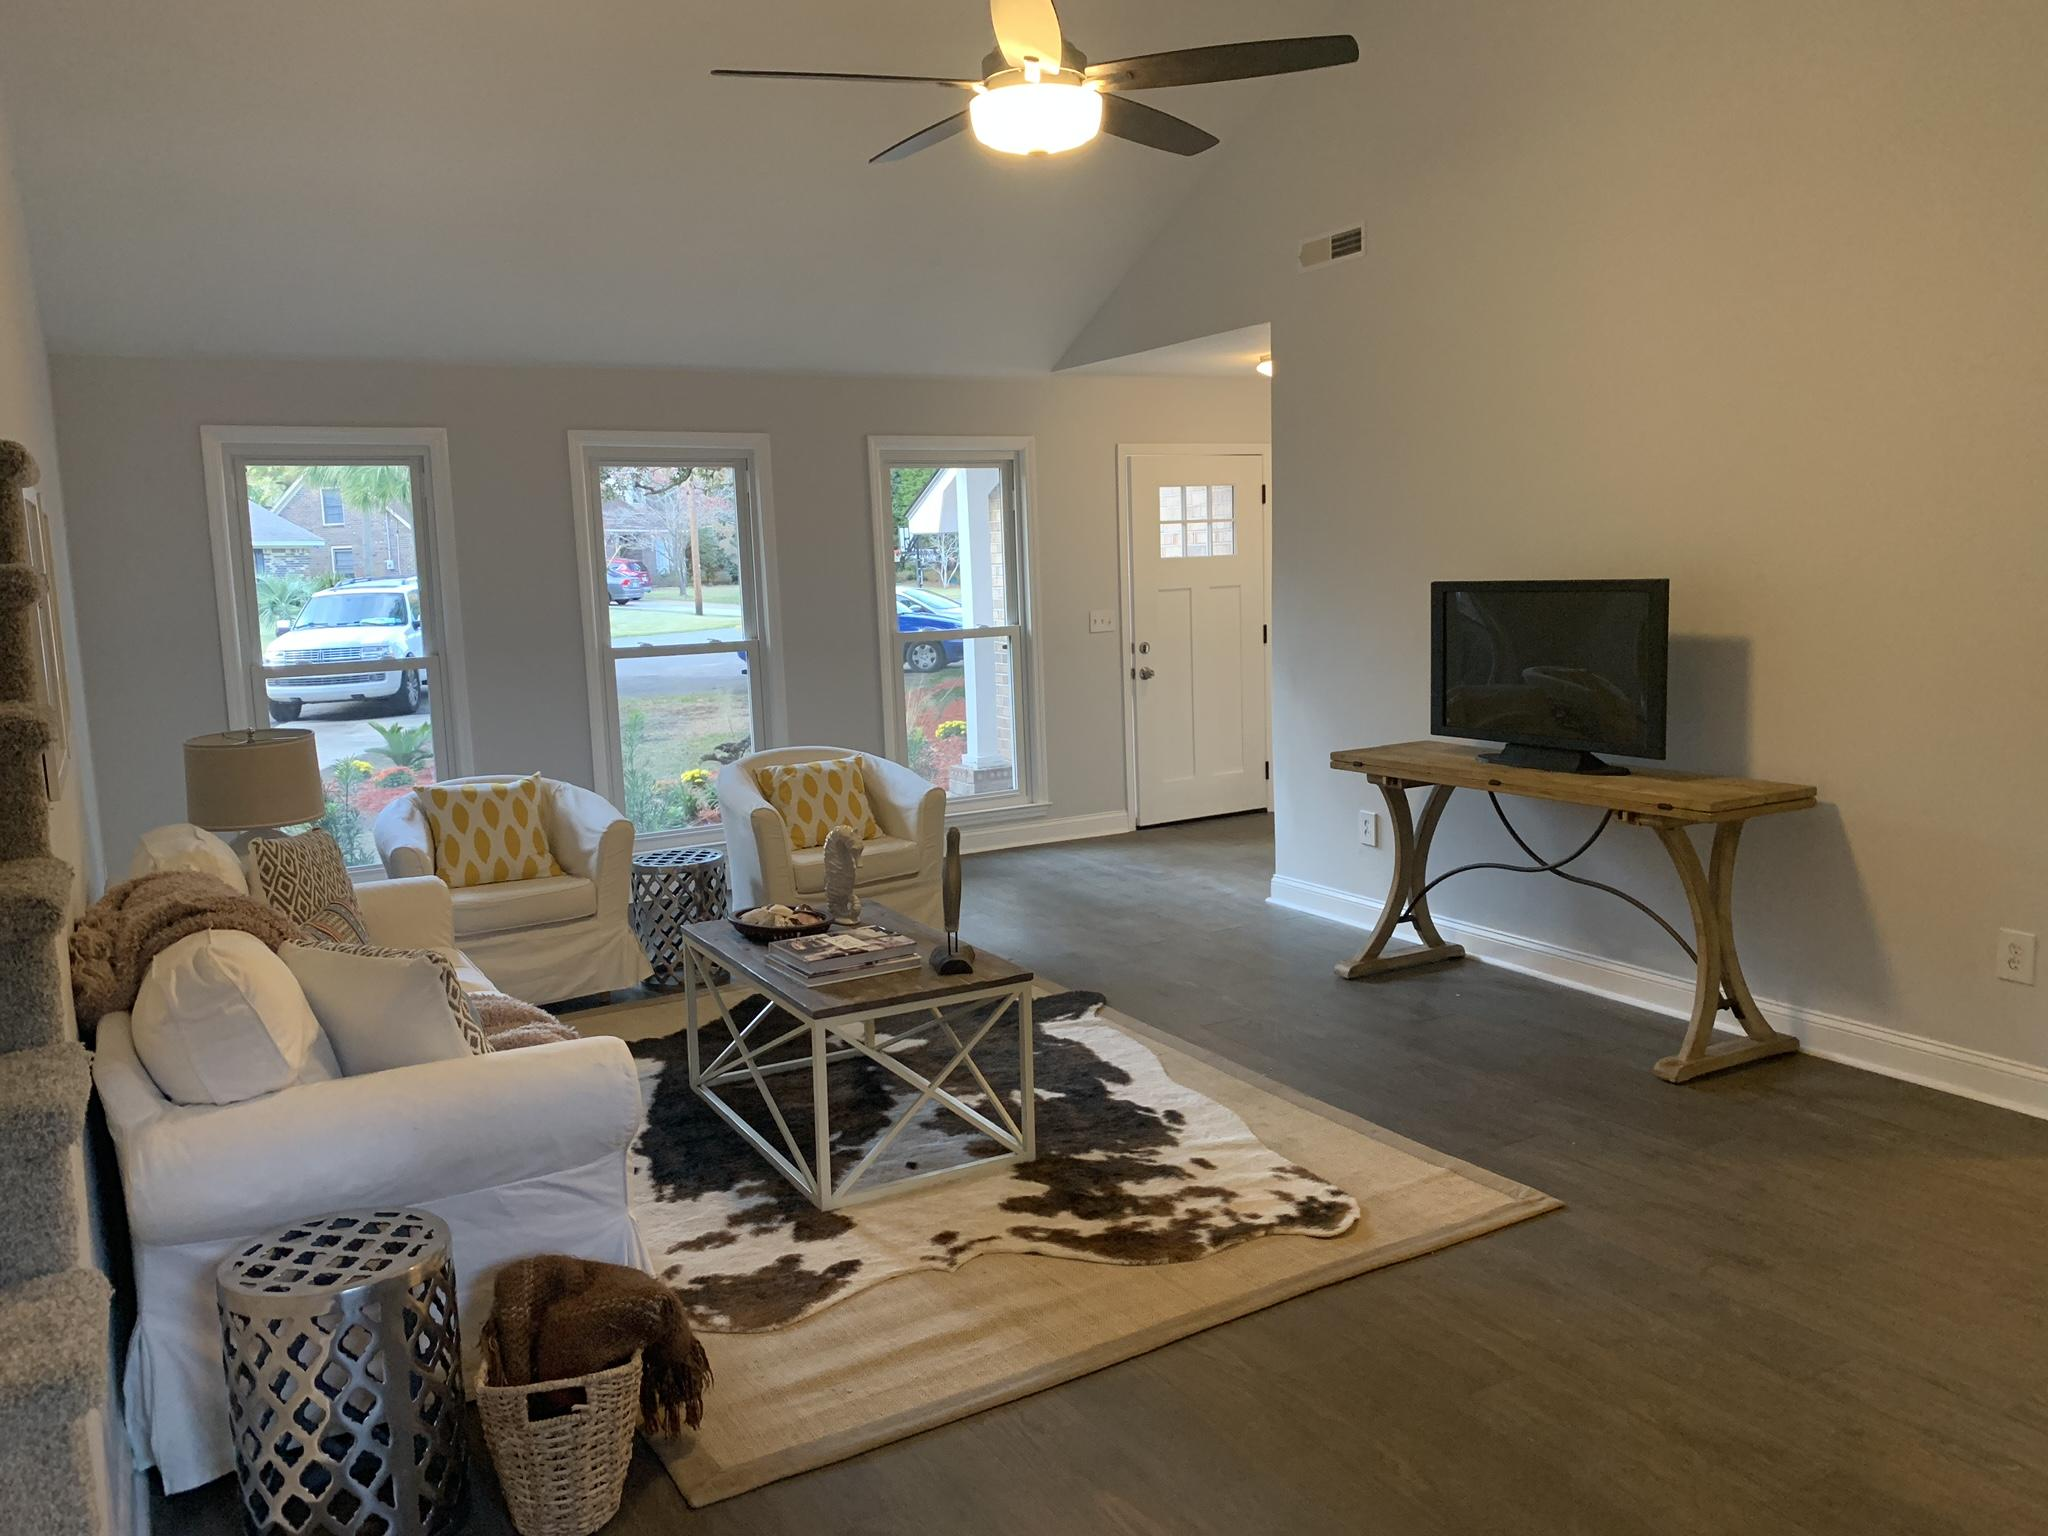 Heathwood Ext Homes For Sale - 2 Blaine, Charleston, SC - 0